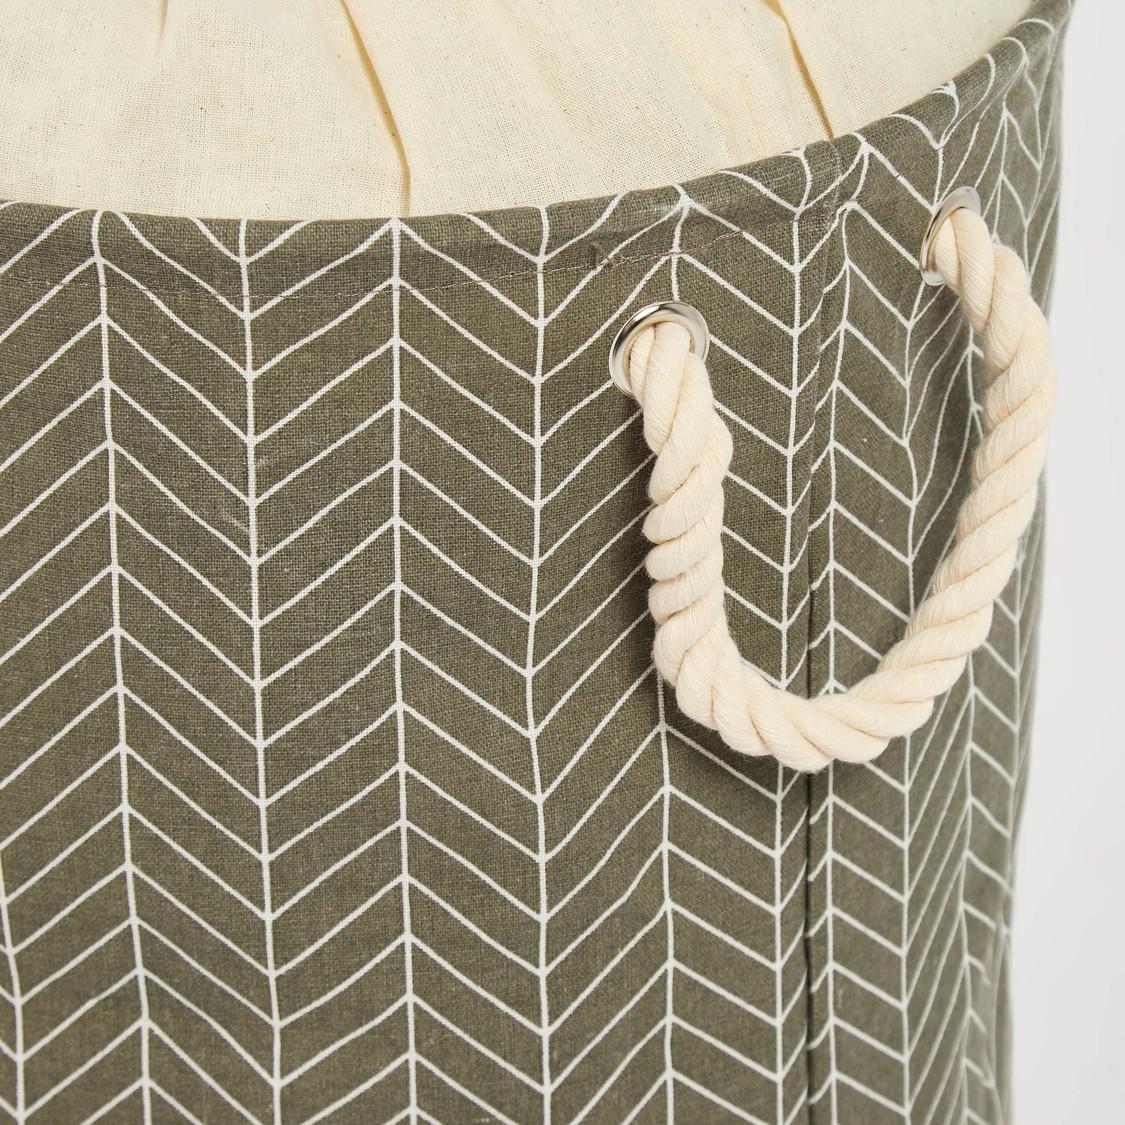 Printed Laundry Hamper with Drawstring Closure - 49x38 cms